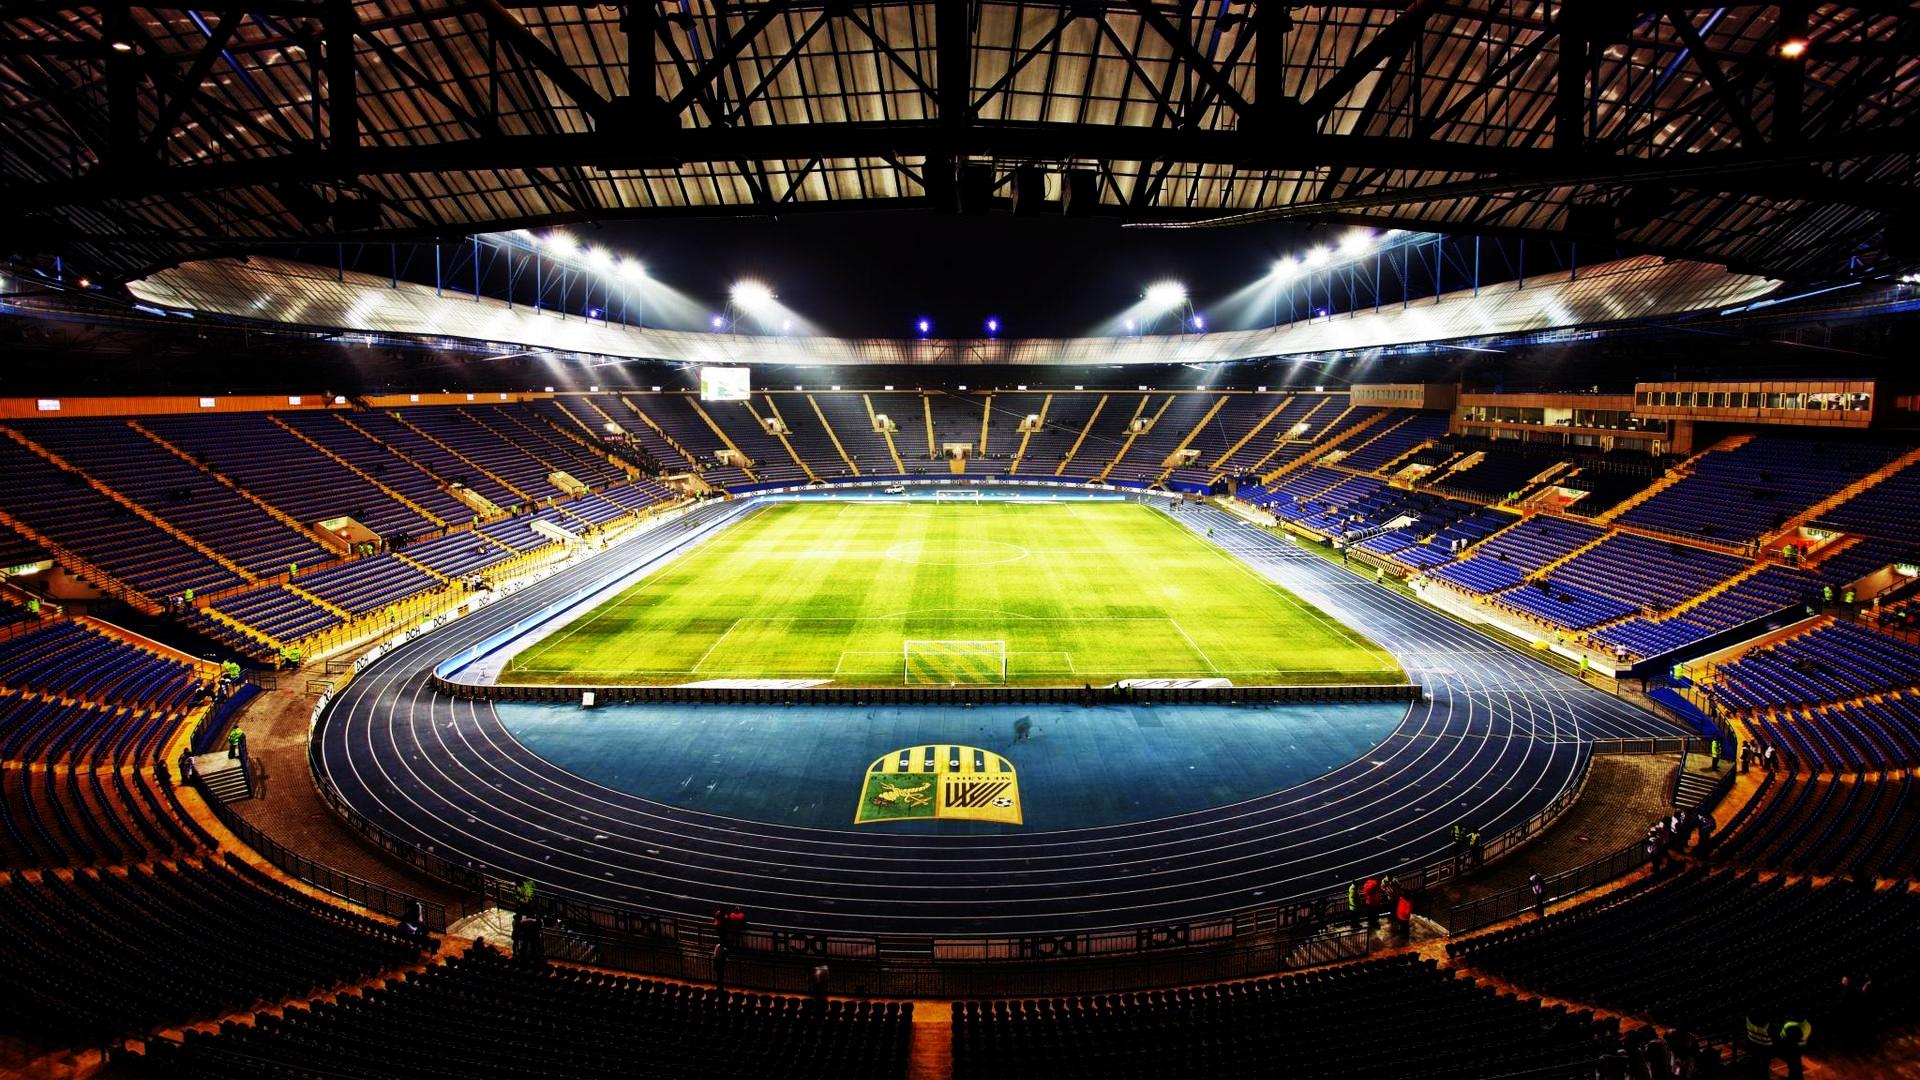 http://4.bp.blogspot.com/-ZLywhESAGFM/UFf_YFW5ncI/AAAAAAAAKDg/E6uC1nB3BbU/s0/fc-metalist-kharkiv-stadium-1920x1080-wallpaper.jpg